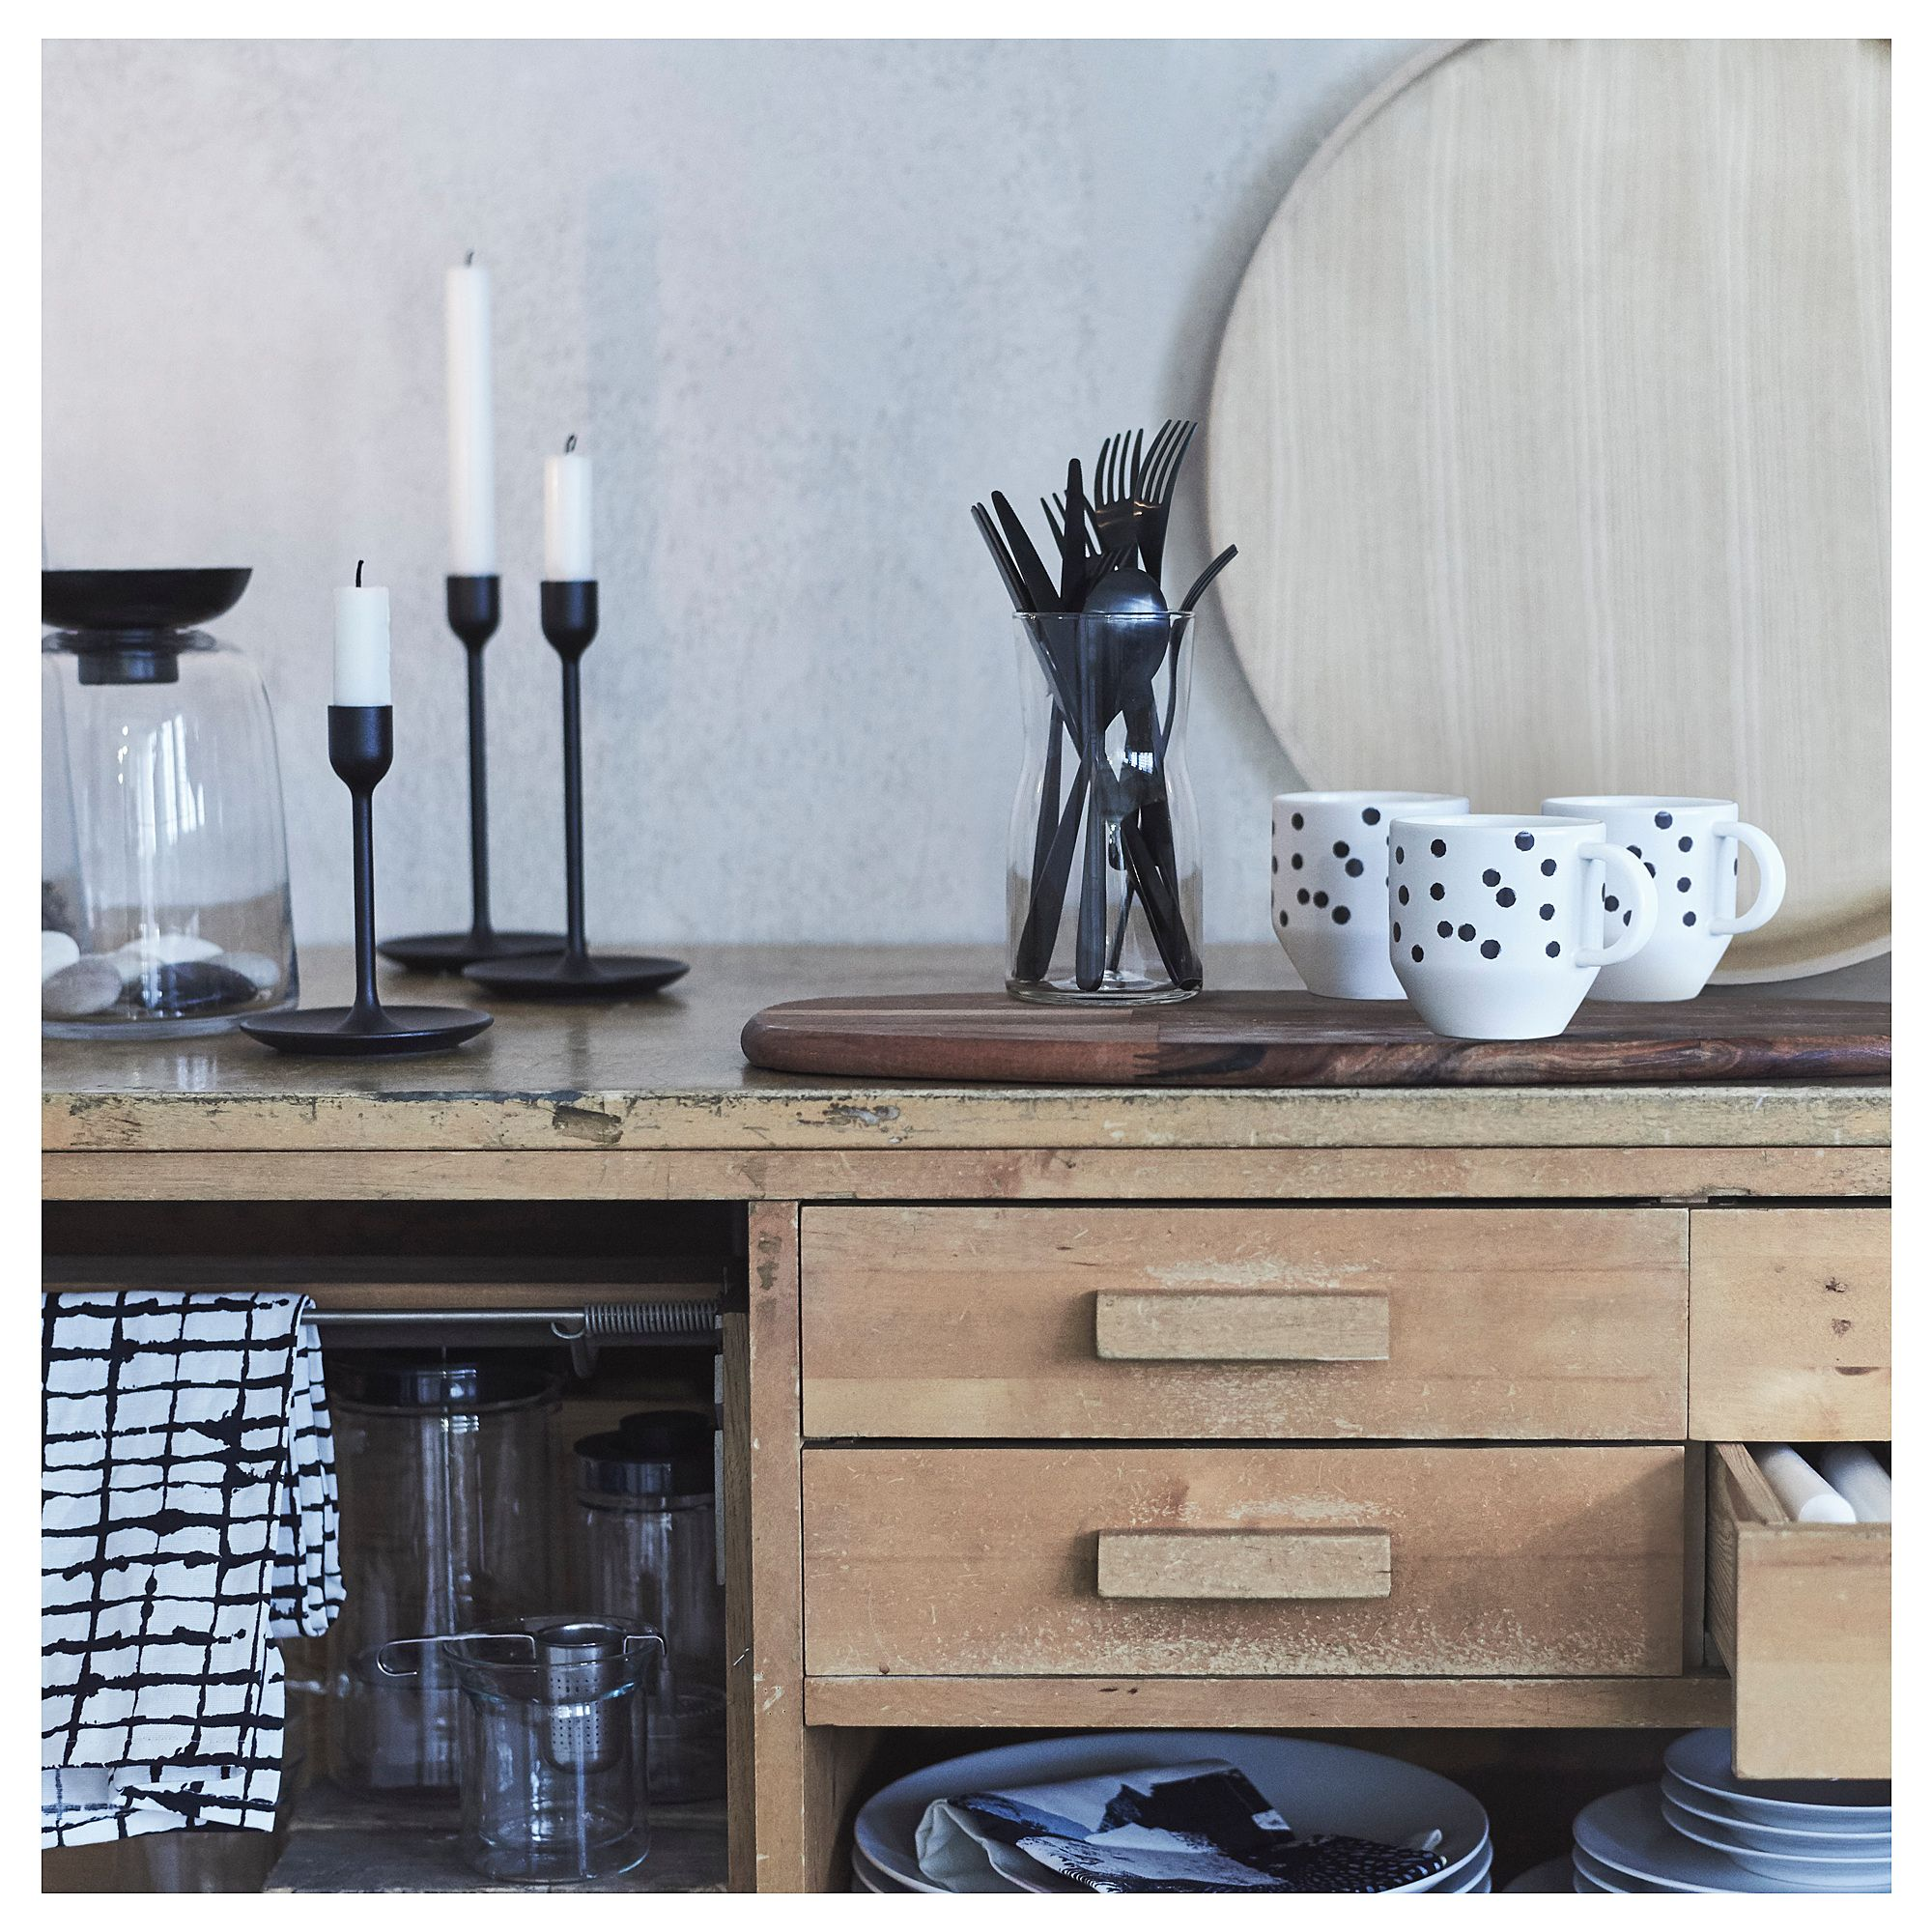 ikea tillagd 20 piece flatware set black in 2019. Black Bedroom Furniture Sets. Home Design Ideas